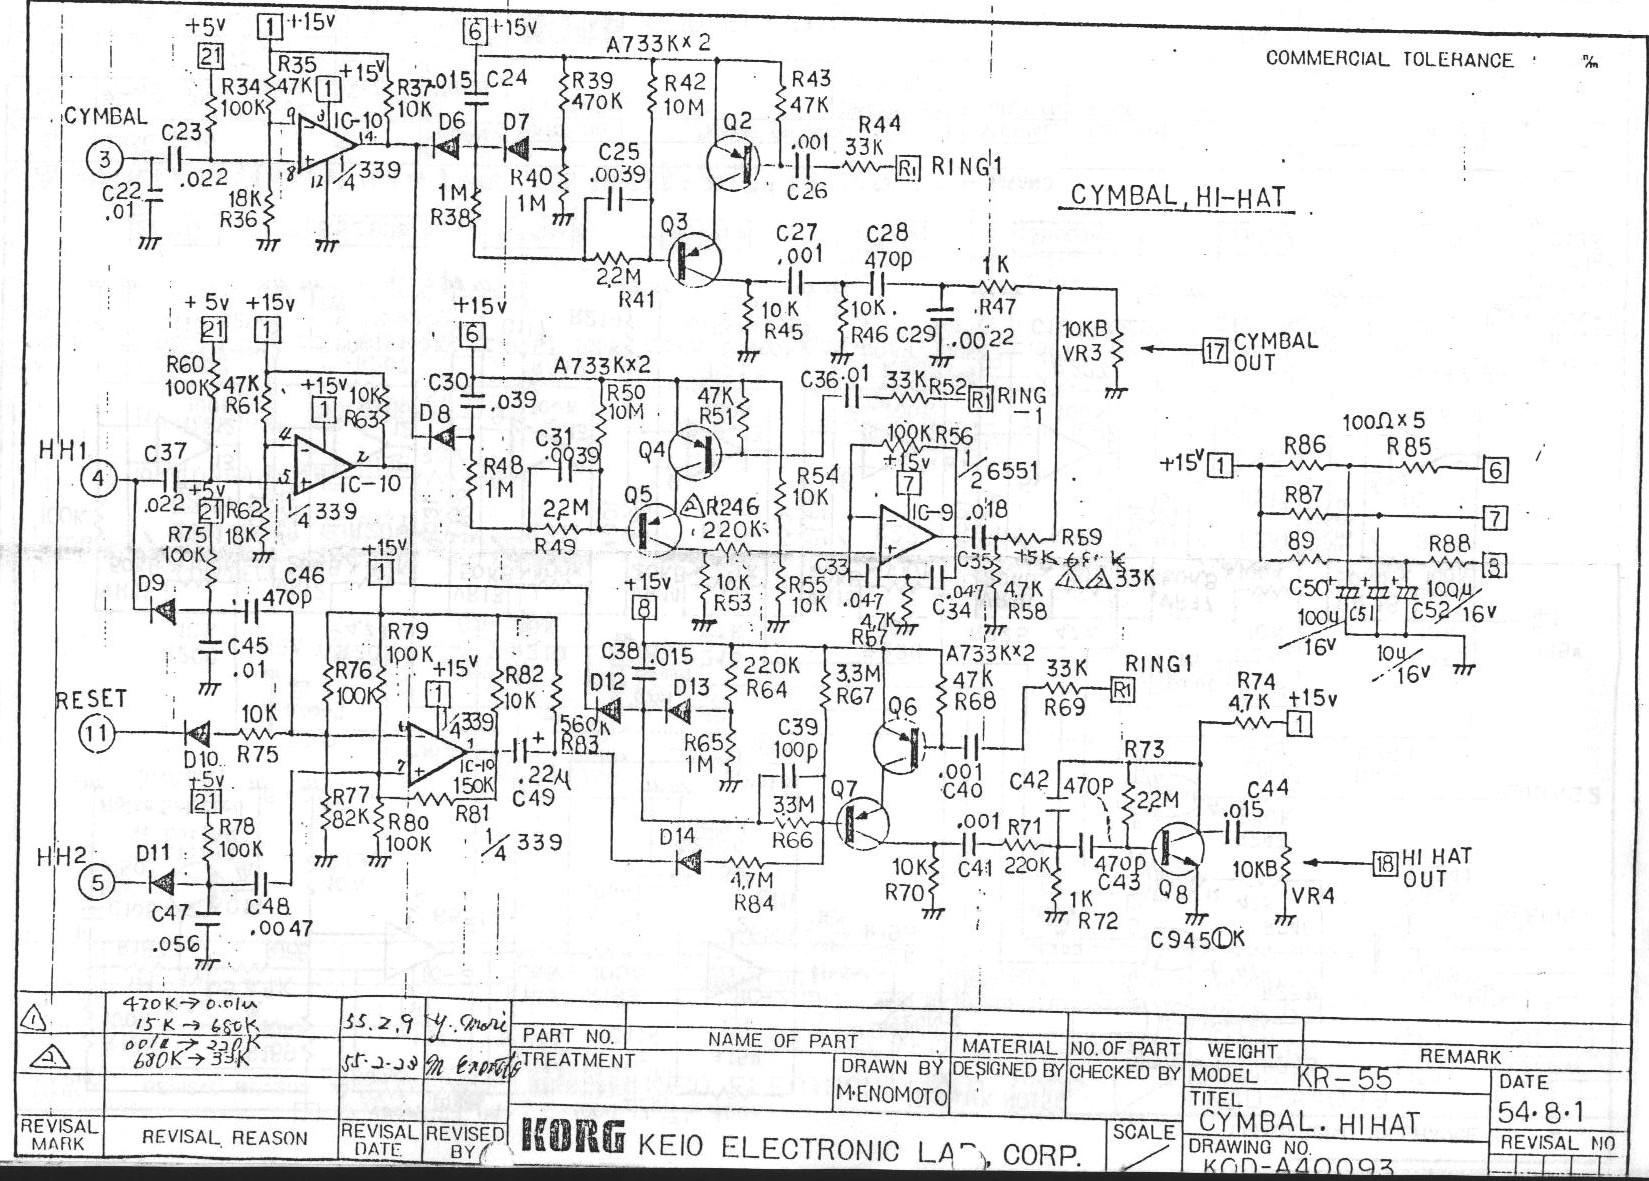 1994 dodge ram 1500 e k diagram